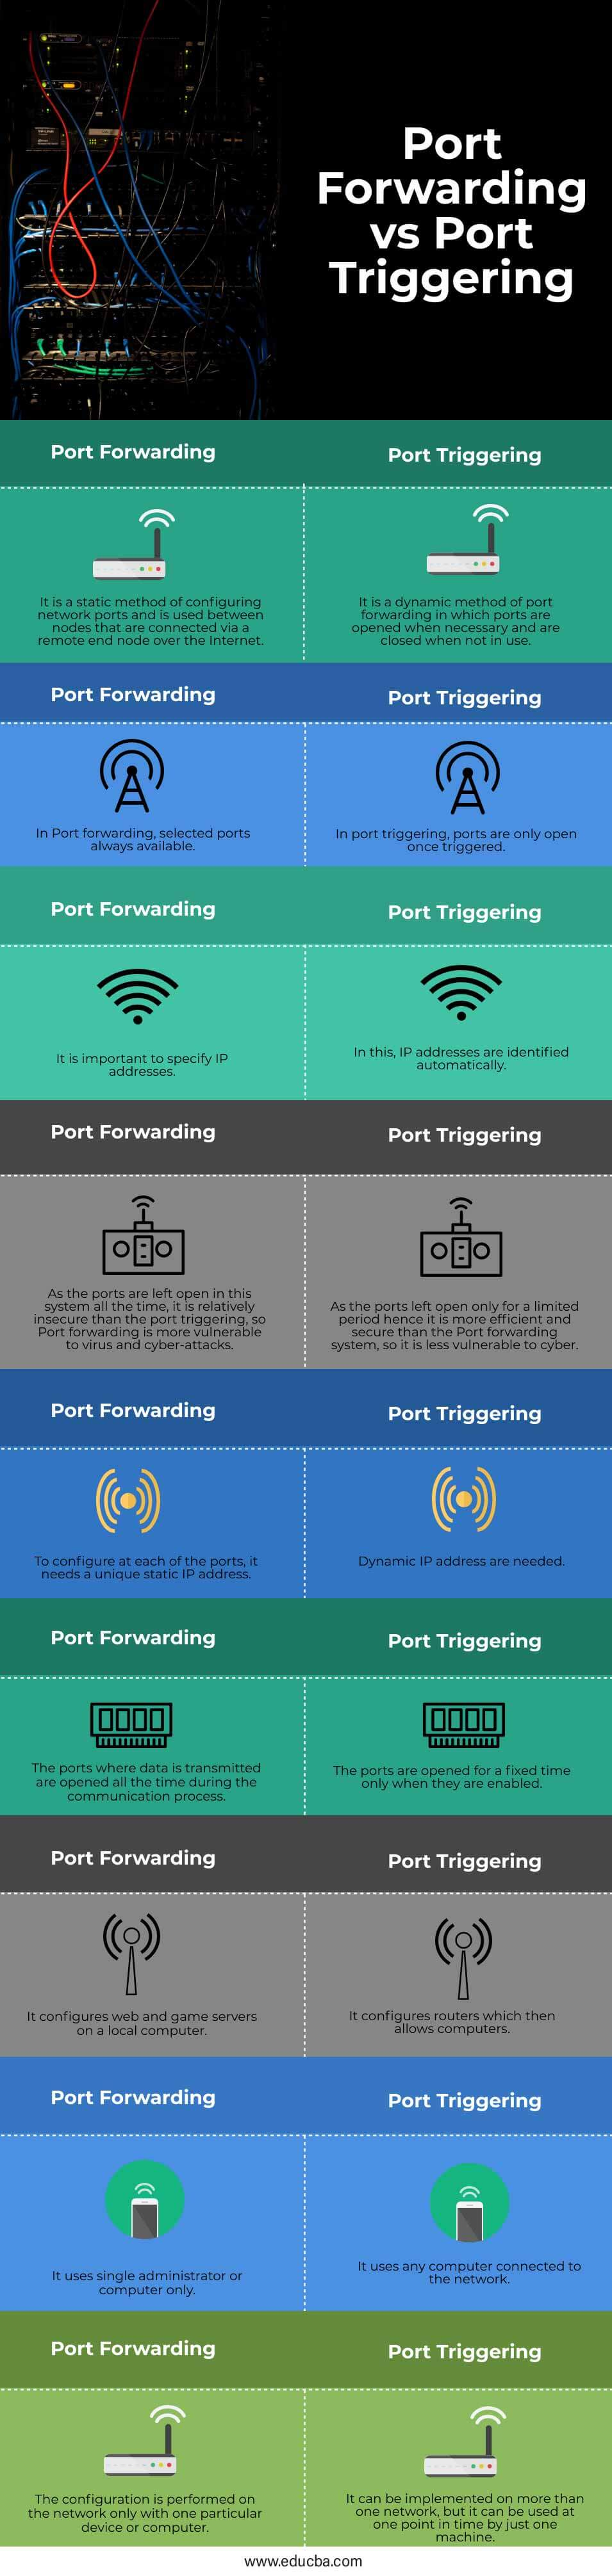 Port-Forwarding-vs-Port-Triggering-info